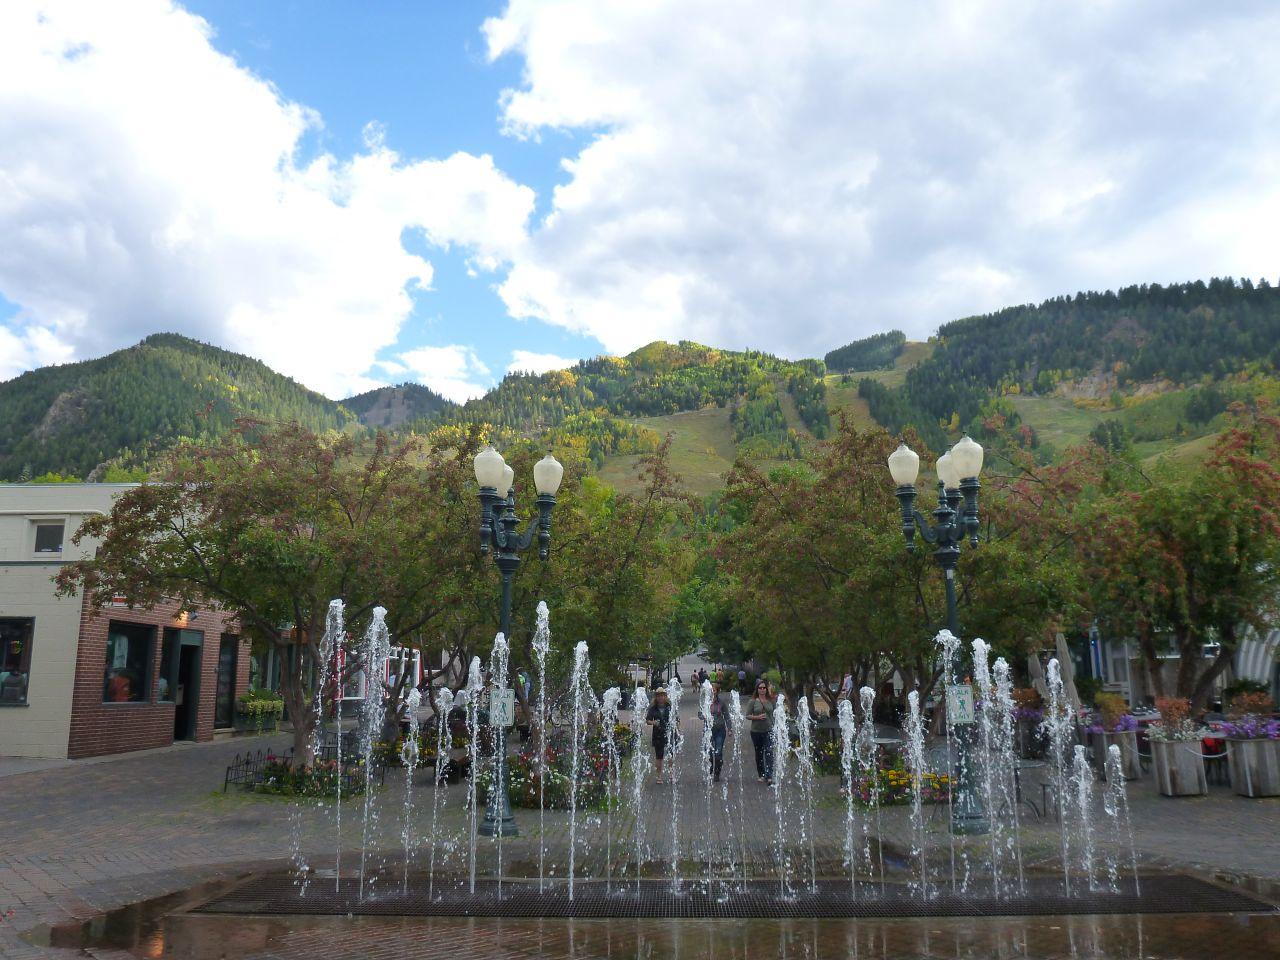 A Fun Fountain With A Gorgeous View